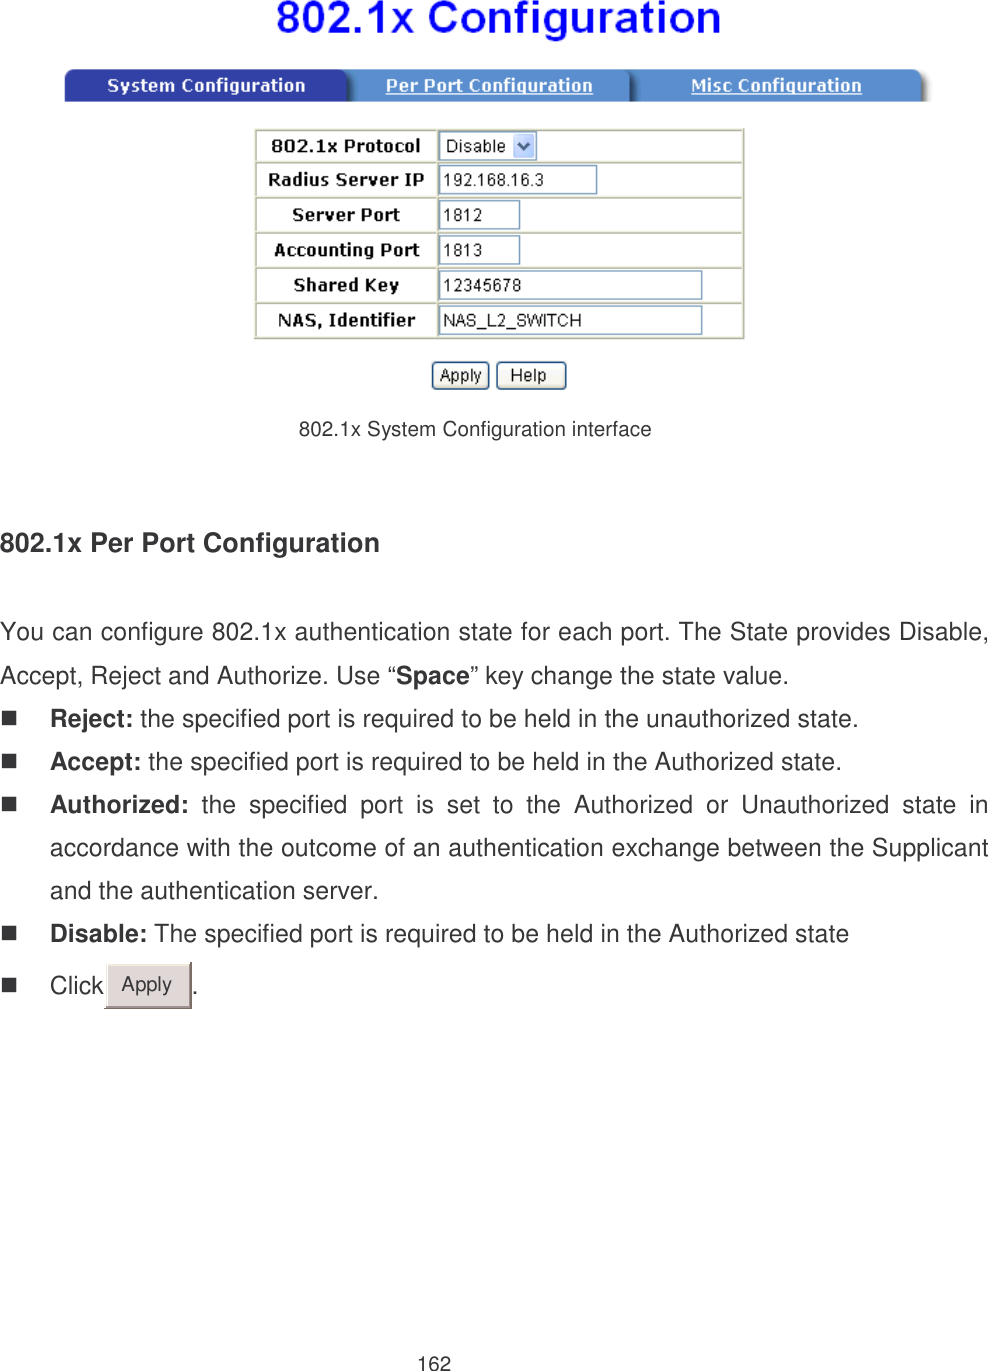 Milan Technology Mil Sm8002Tg Users Manual SM8002TG_Manual_A2